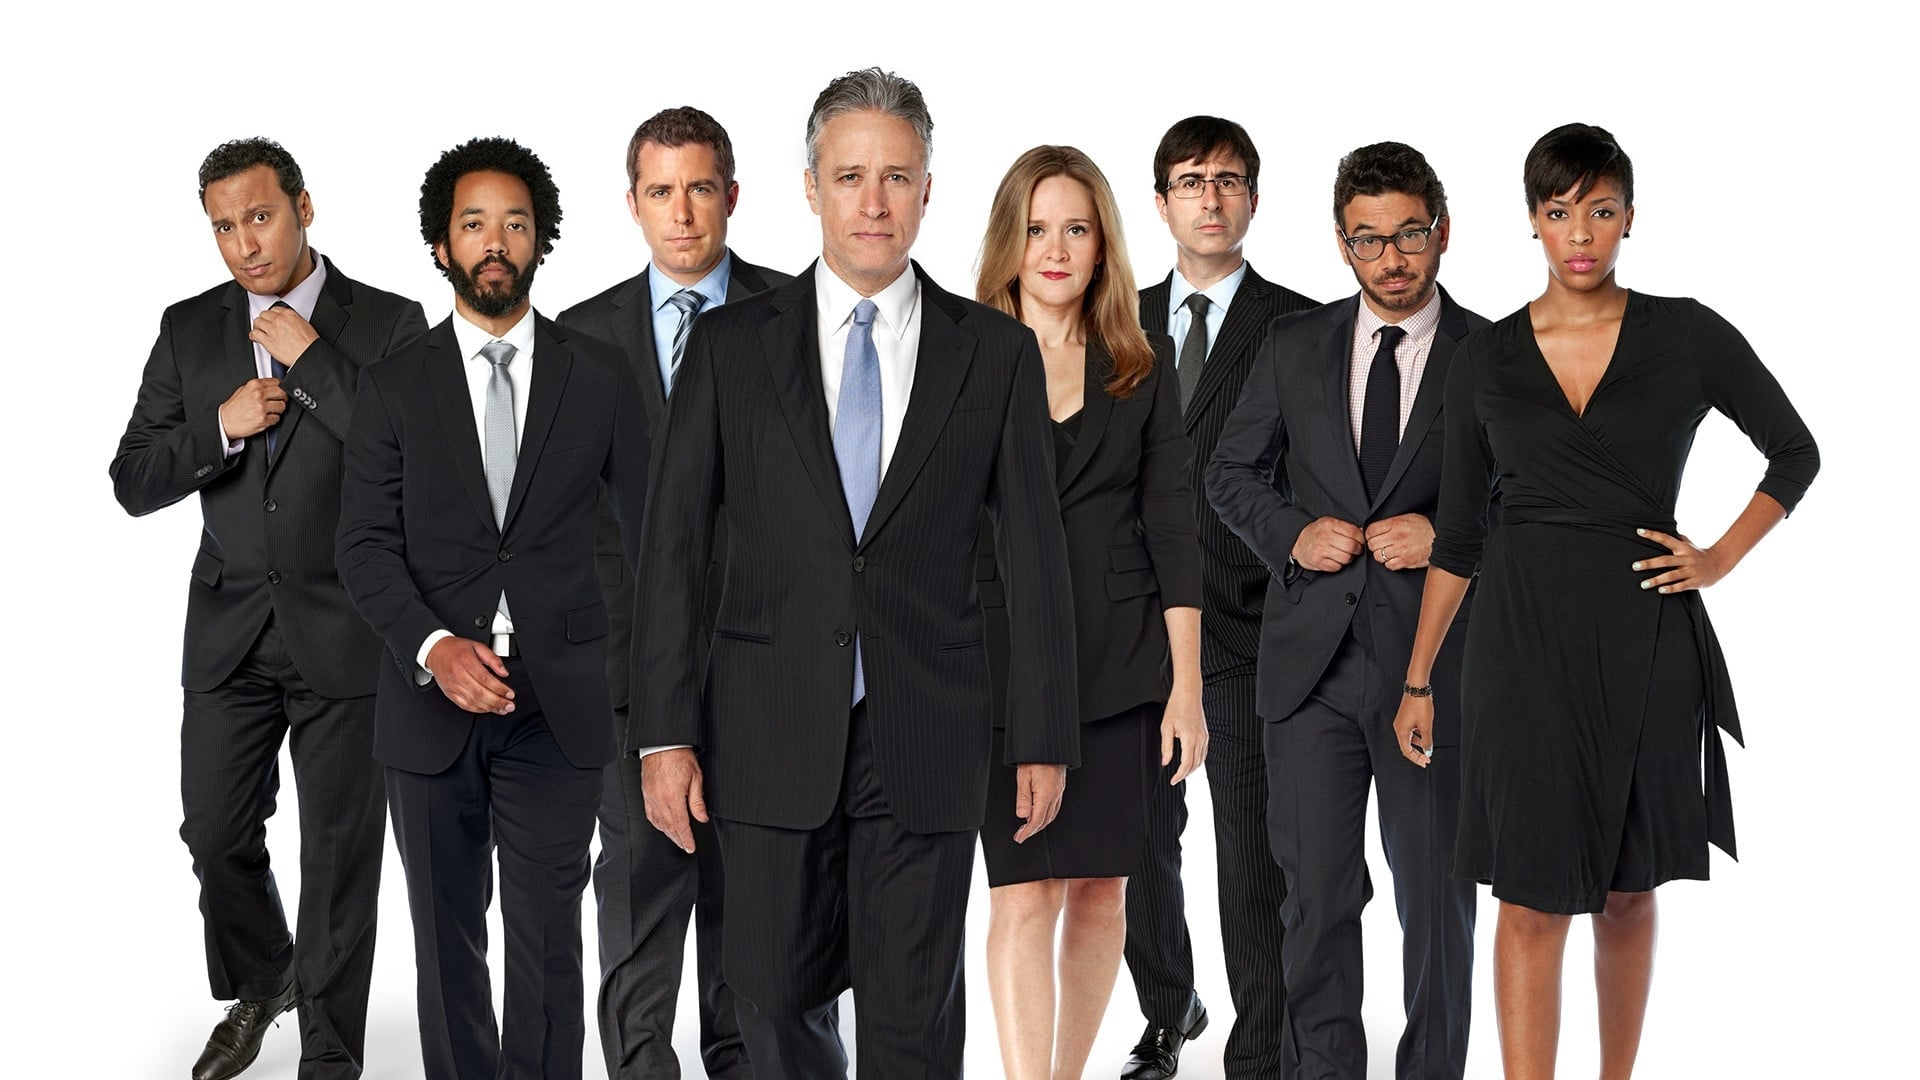 The Daily Show with Trevor Noah - Season 11